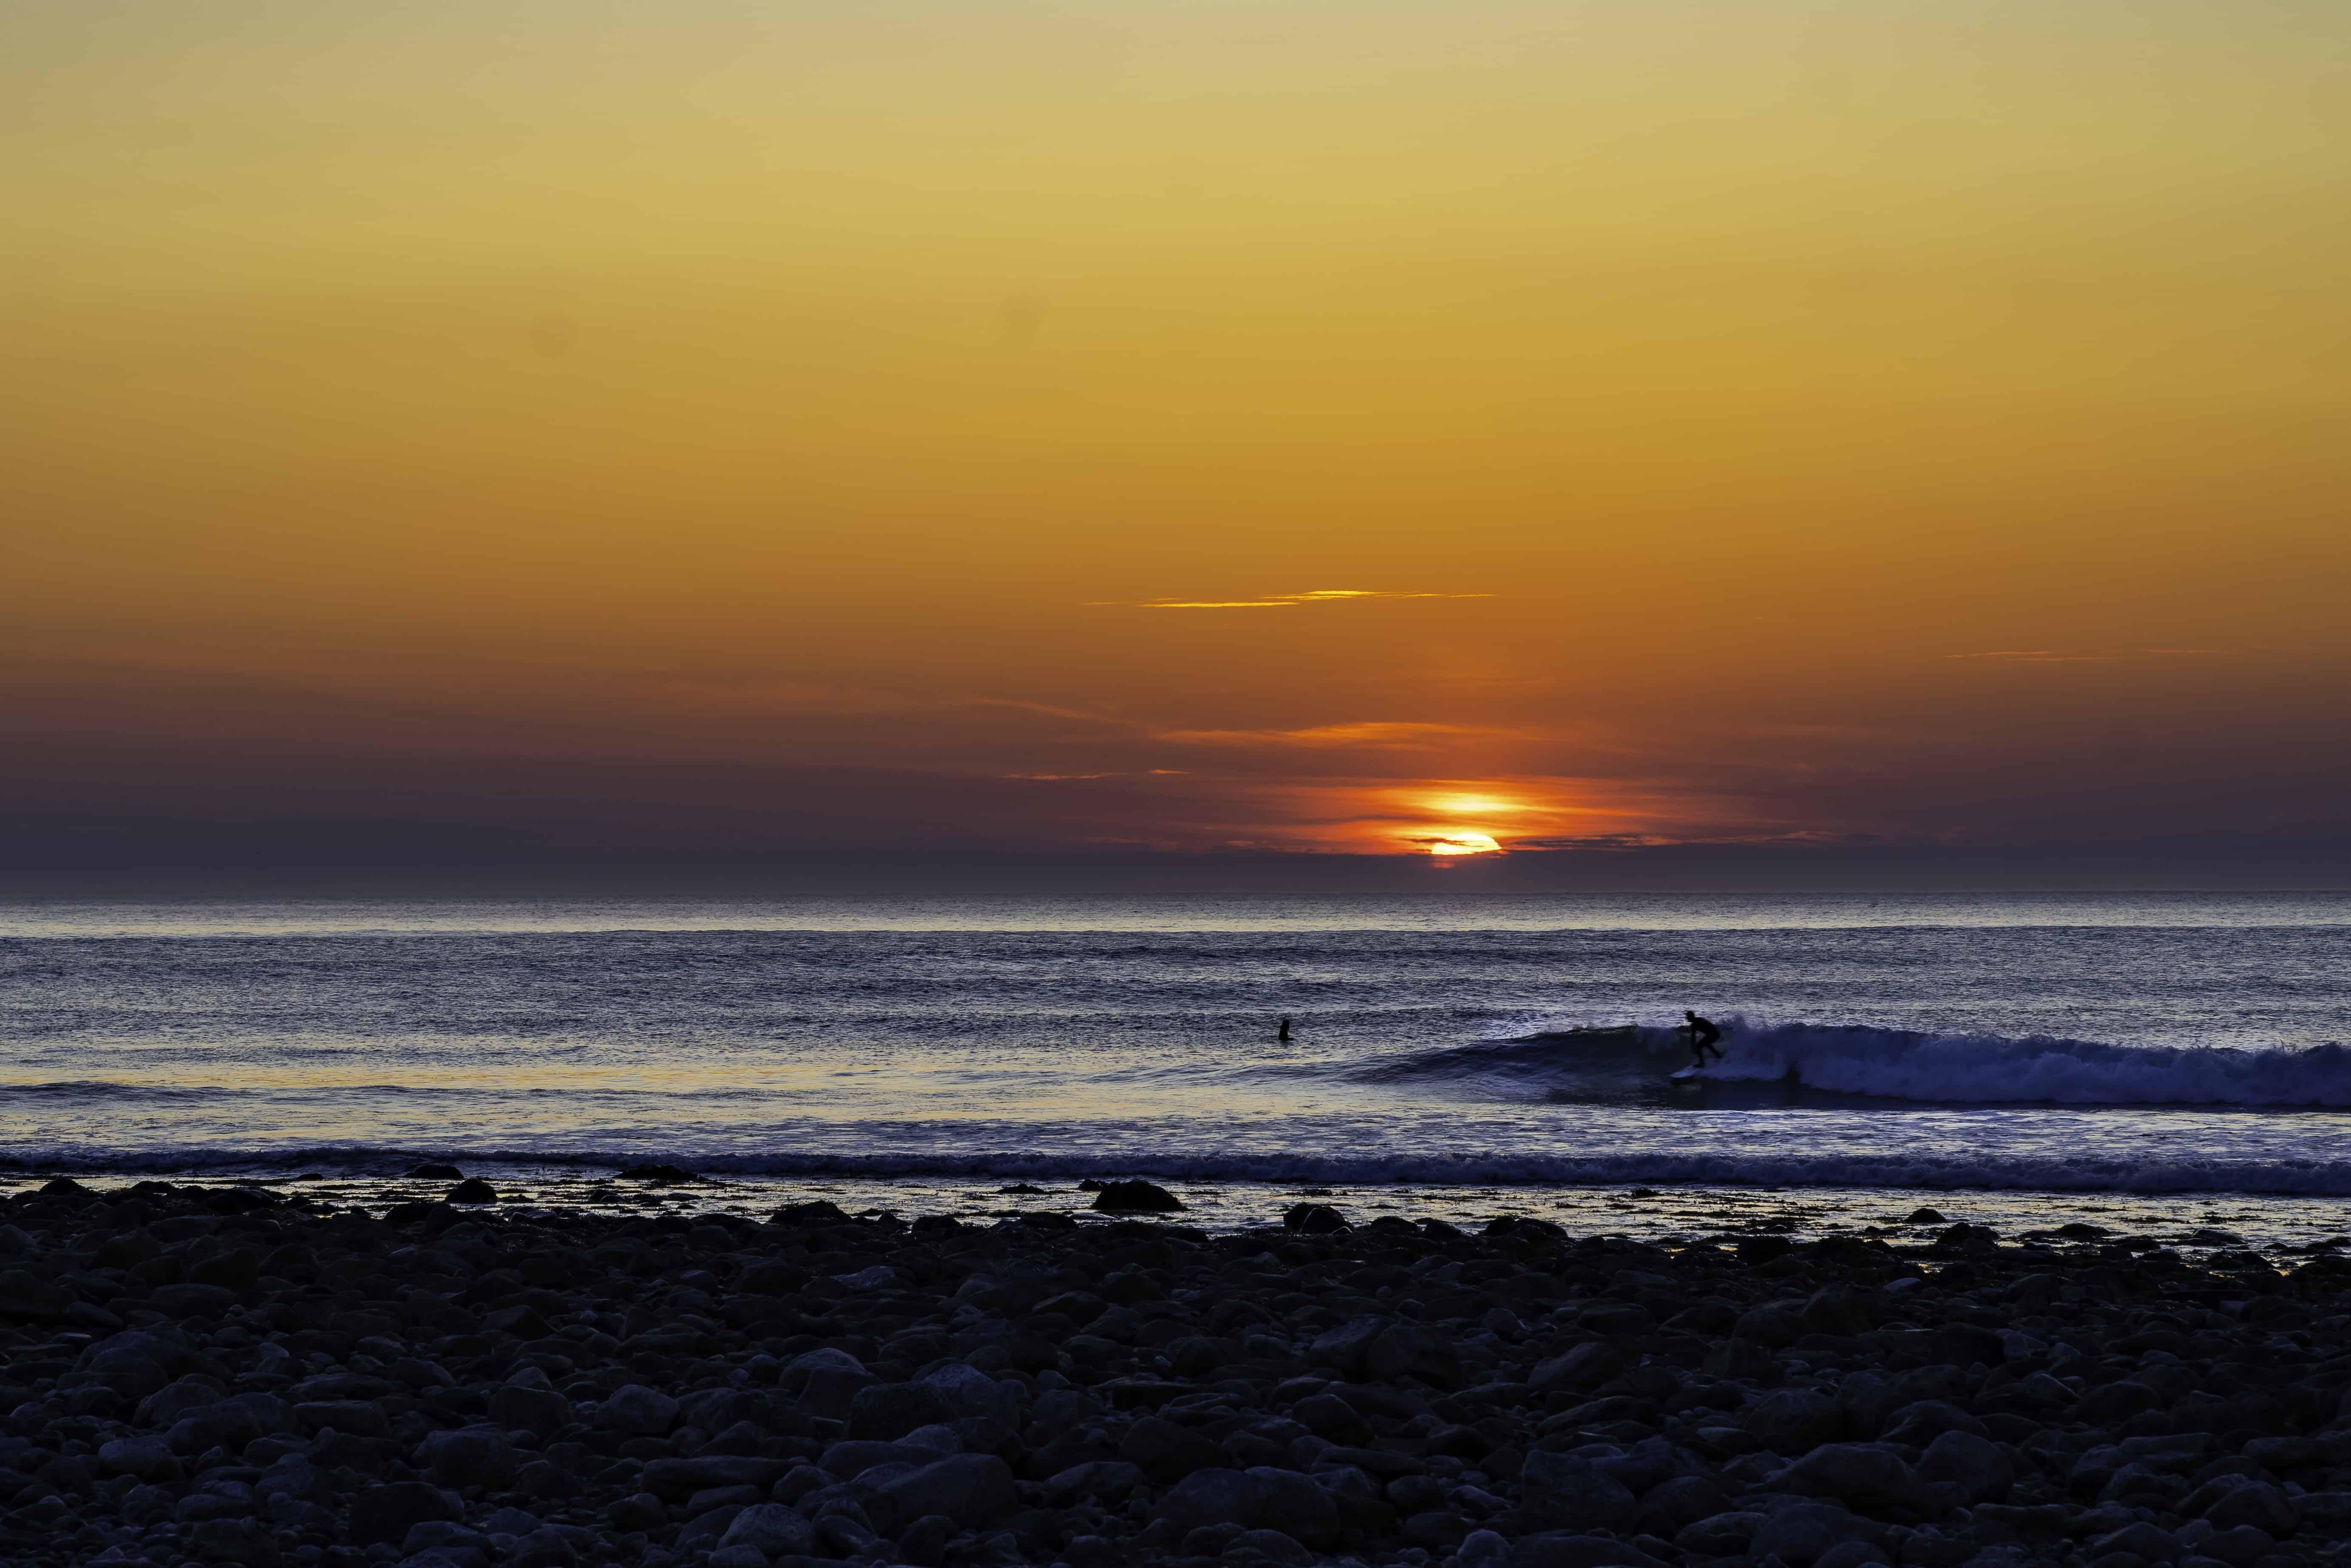 Perfekt solnedgang - Renata Margaret Aulejtner